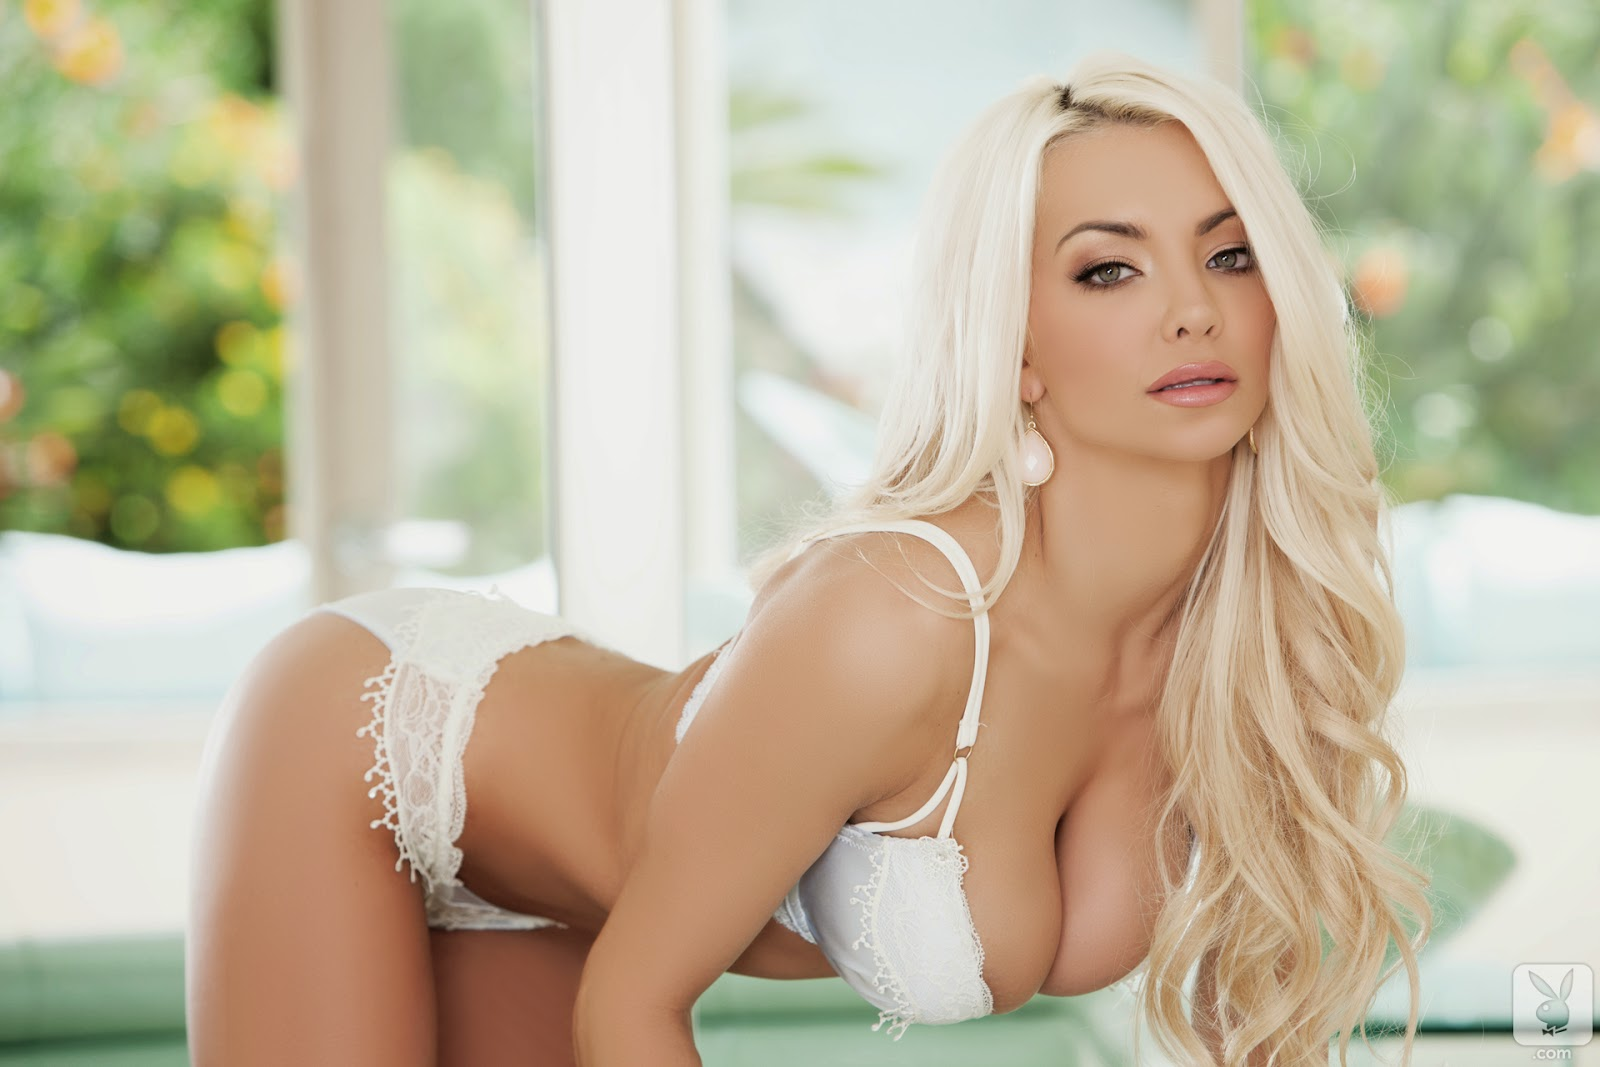 Big tits tight bikini blonde posing